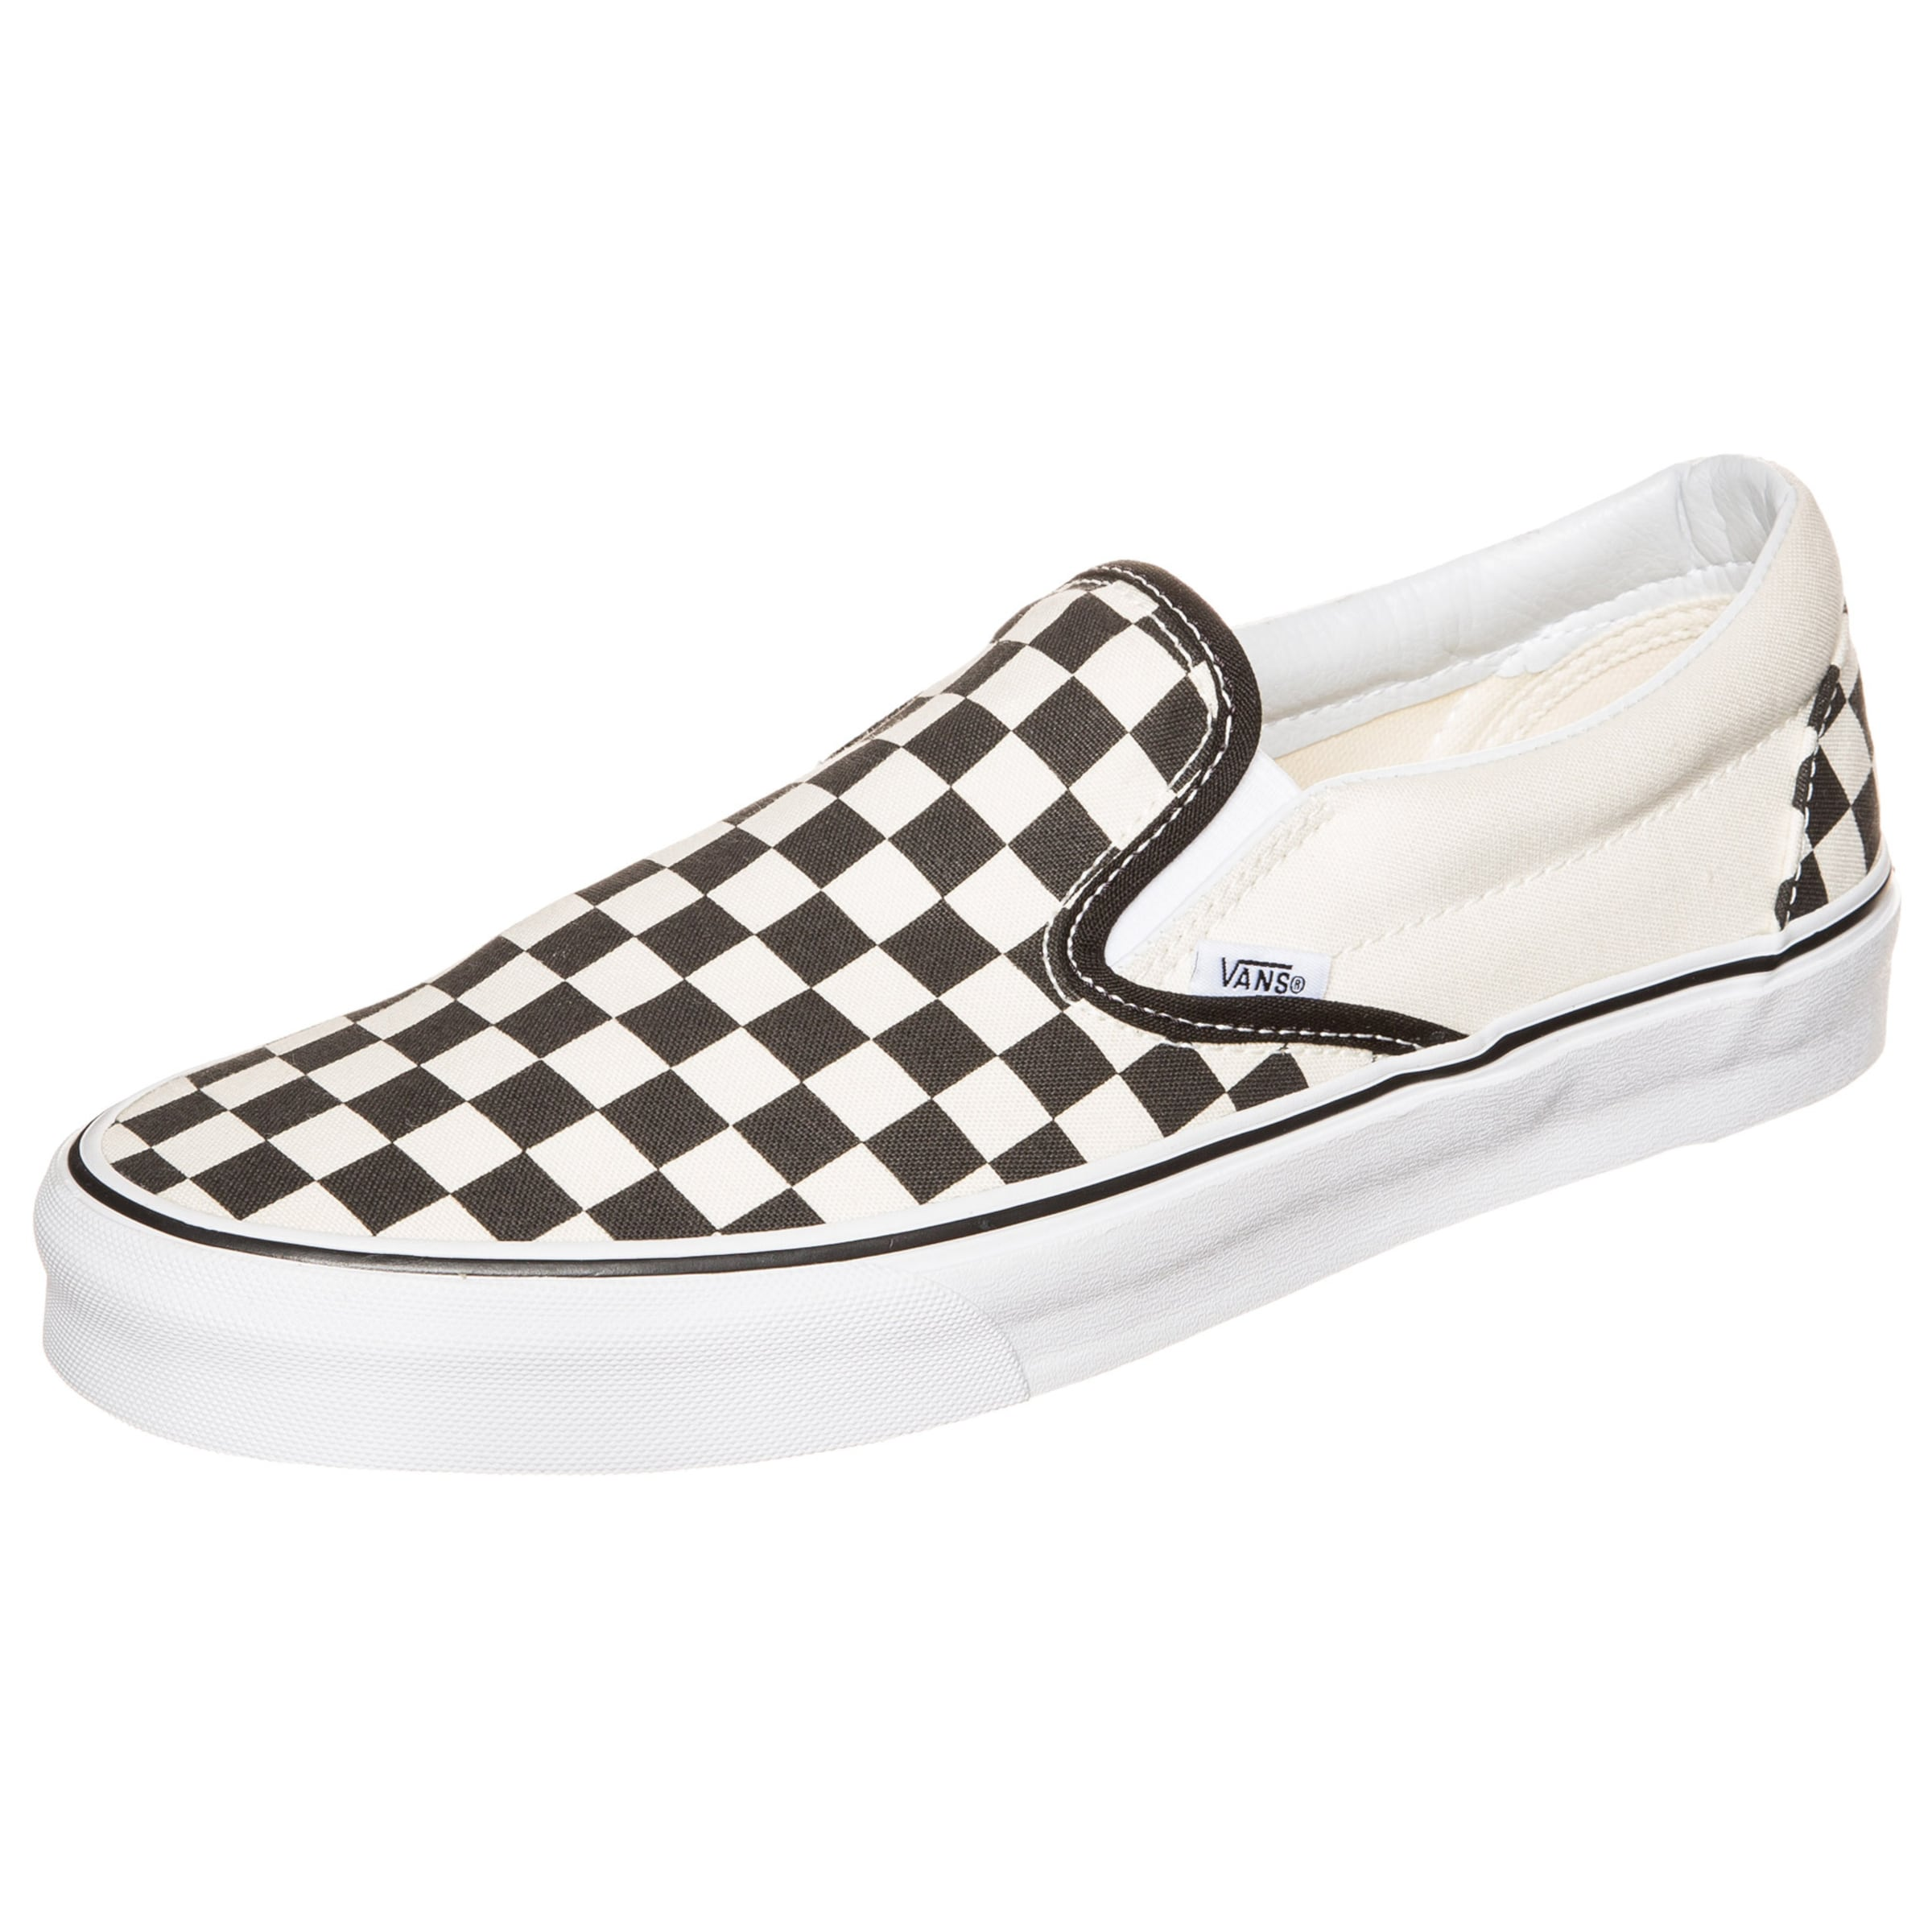 VANS Sneaker Classic Slip-On Checkerboard Hohe Qualität